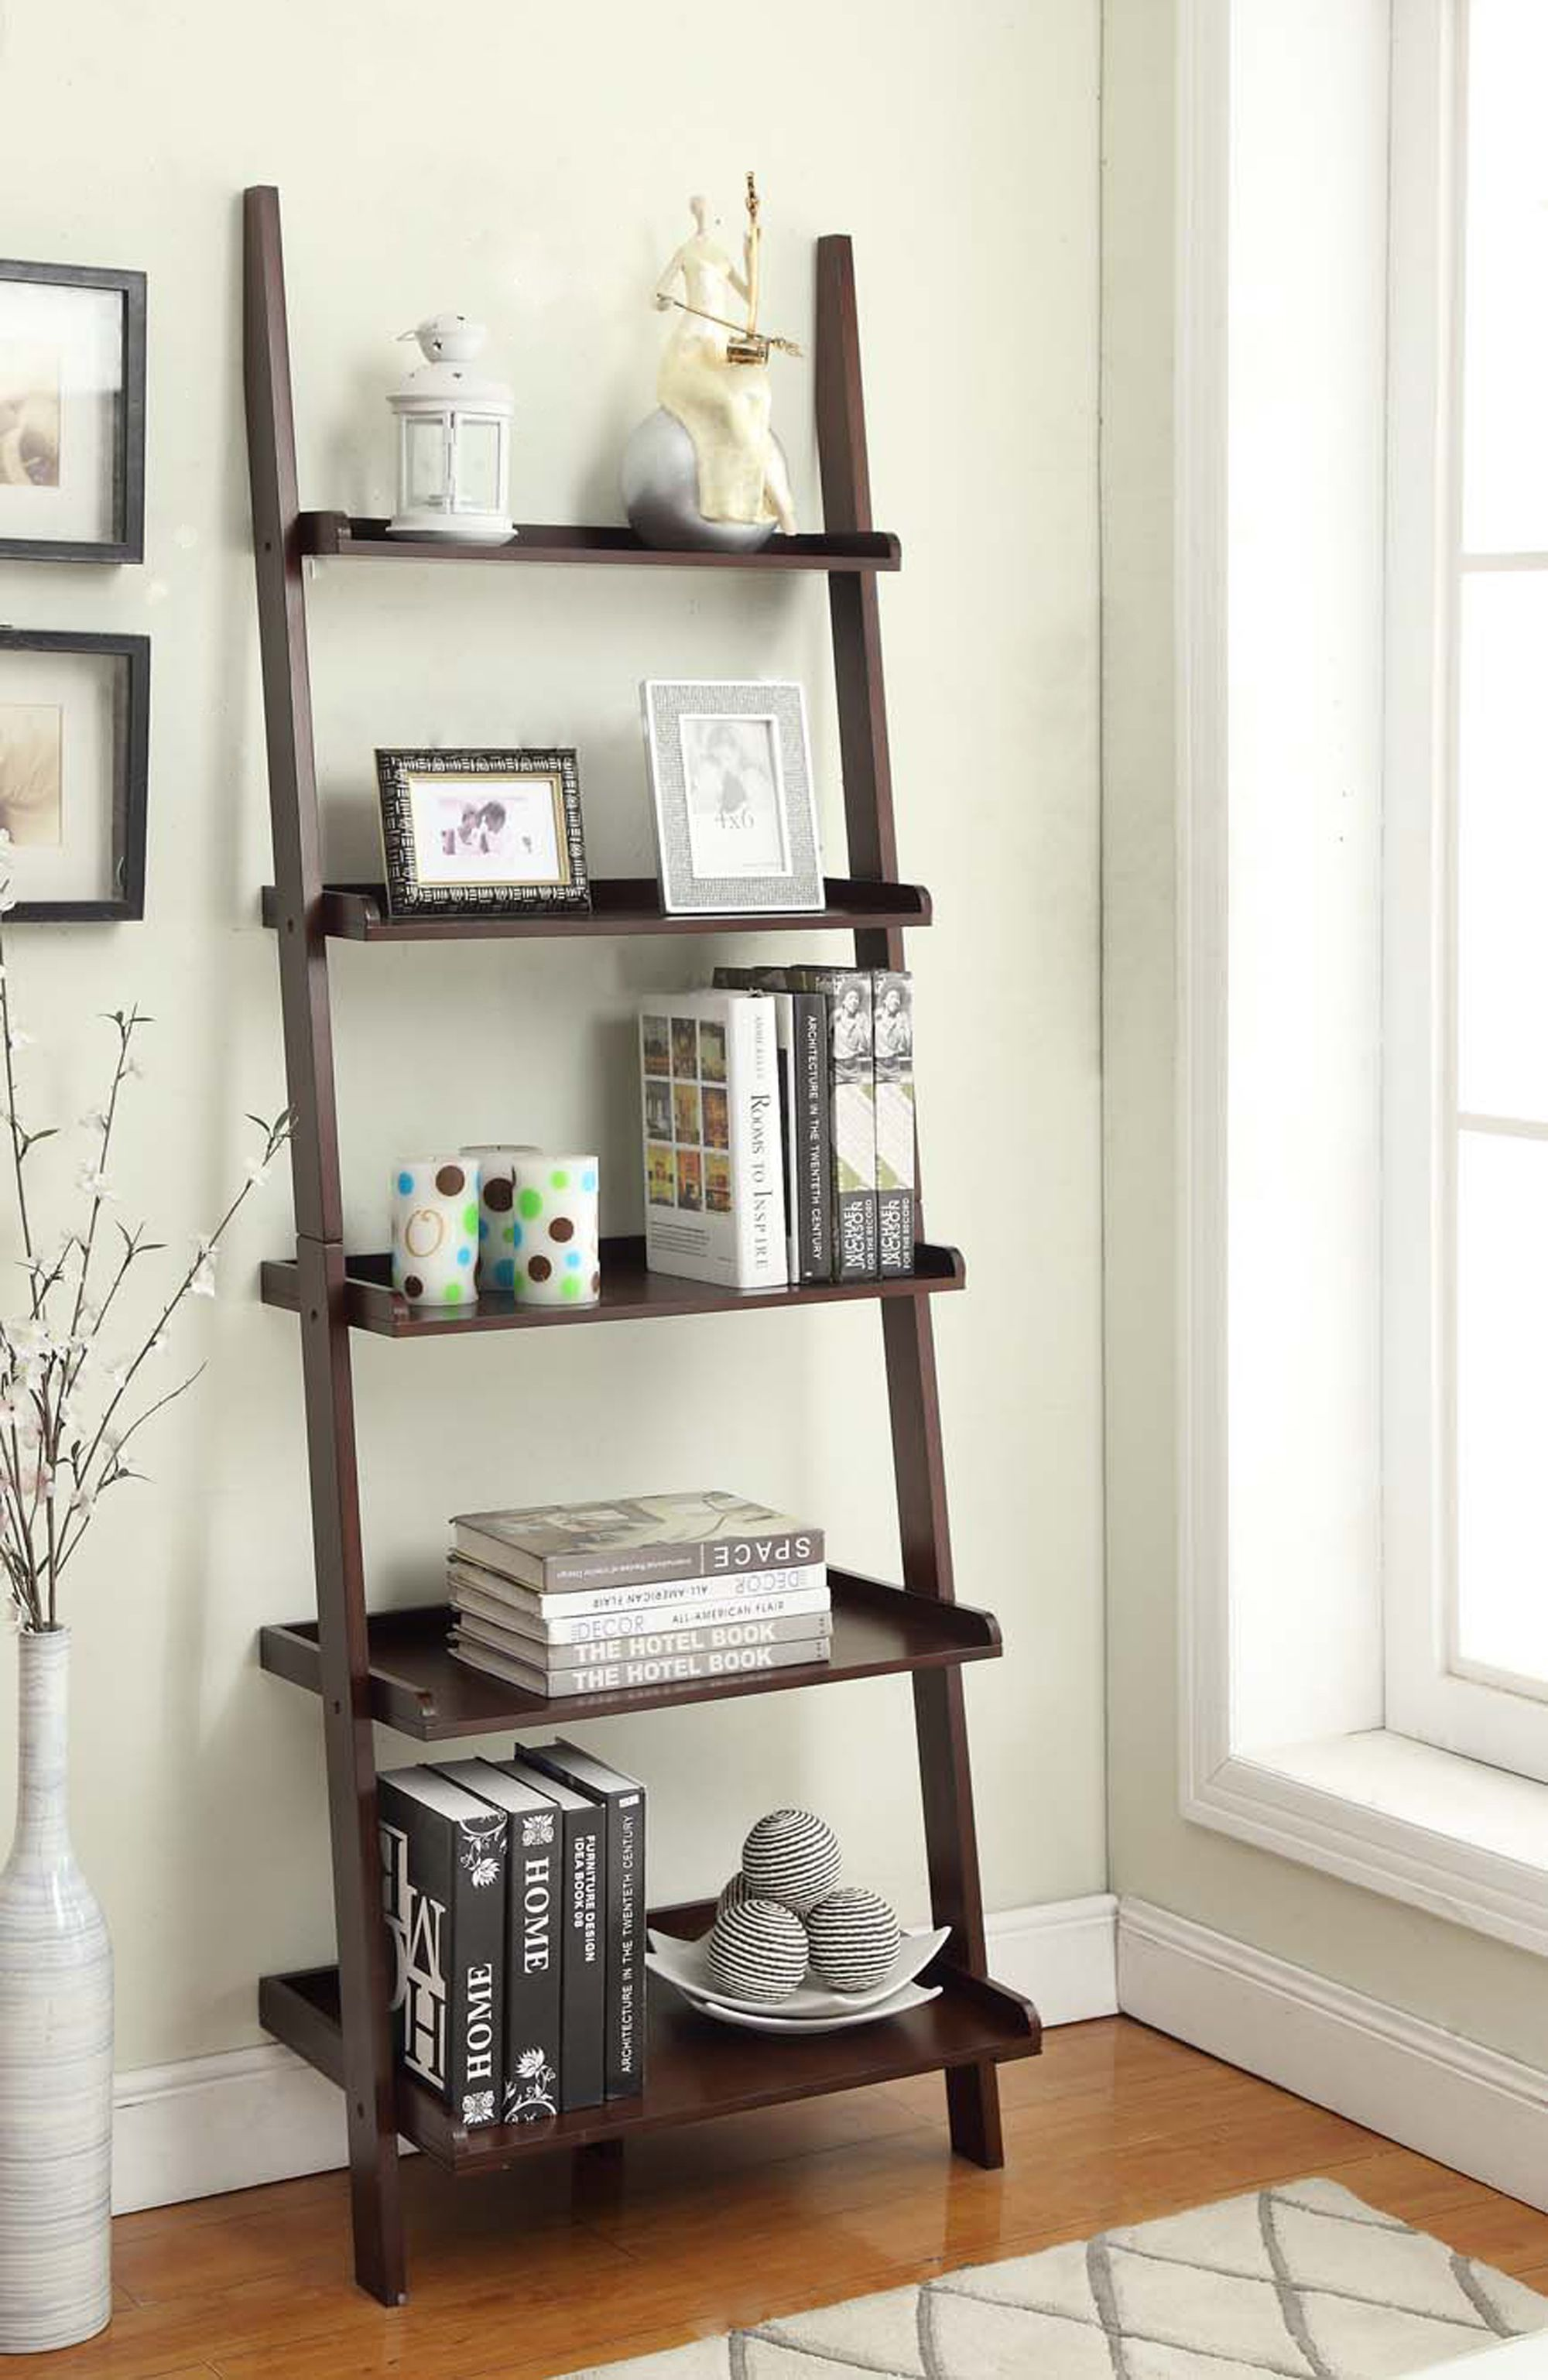 Home Ladder Bookshelf Ladder Shelf Decor Living Room Storage